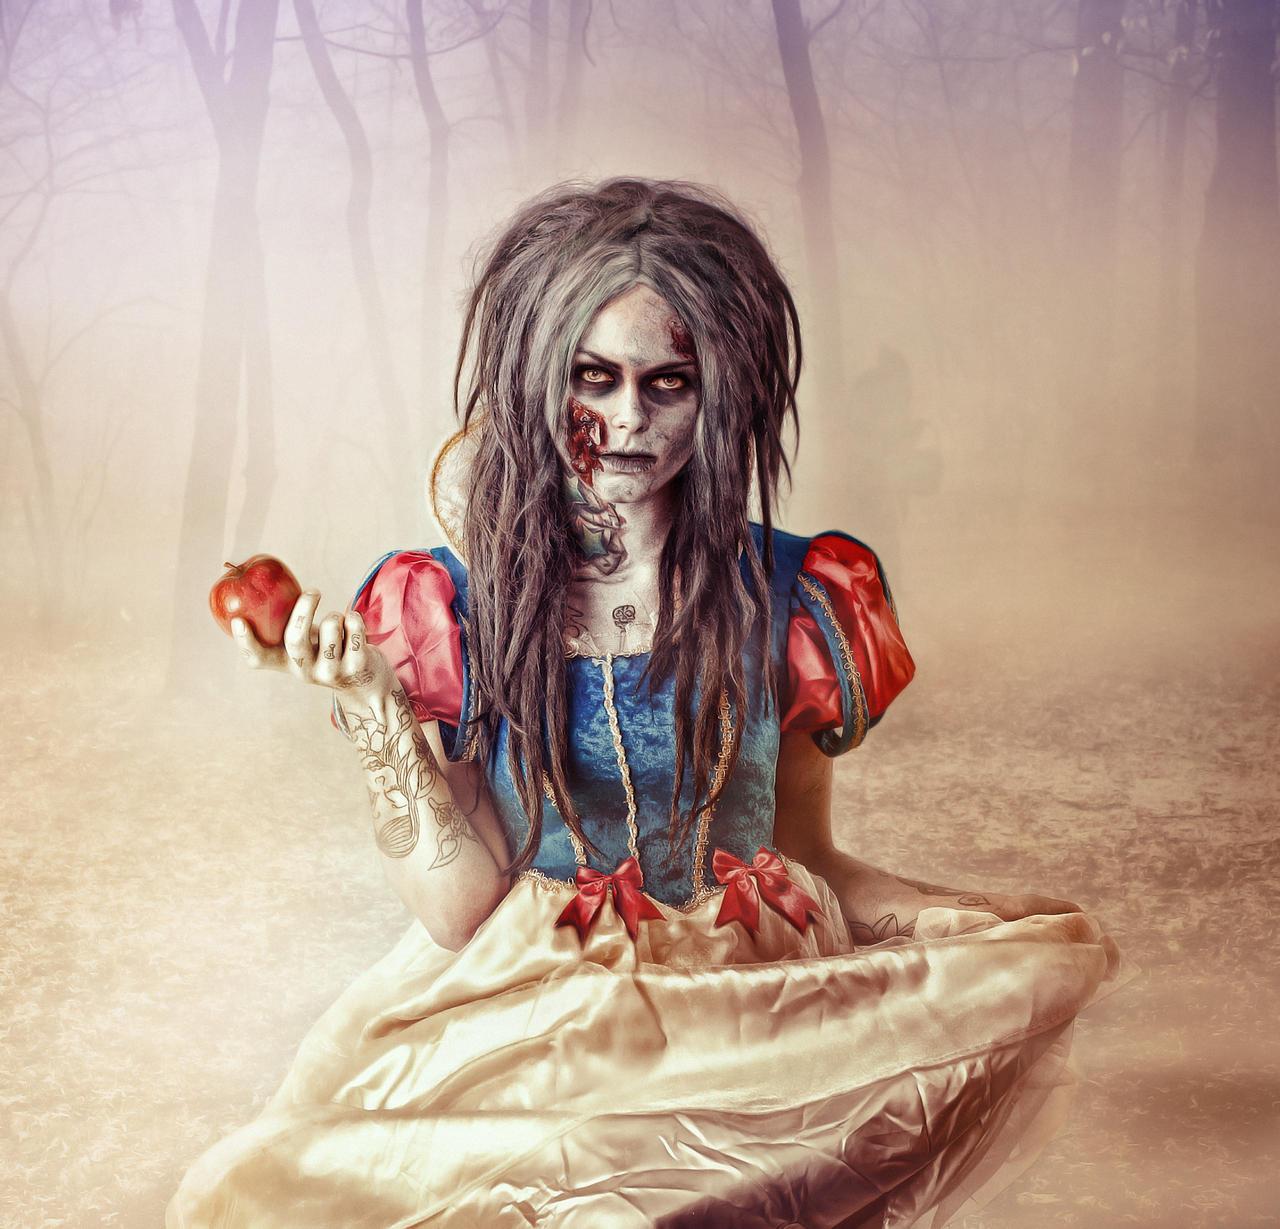 Snow White zombie by G-10gian82